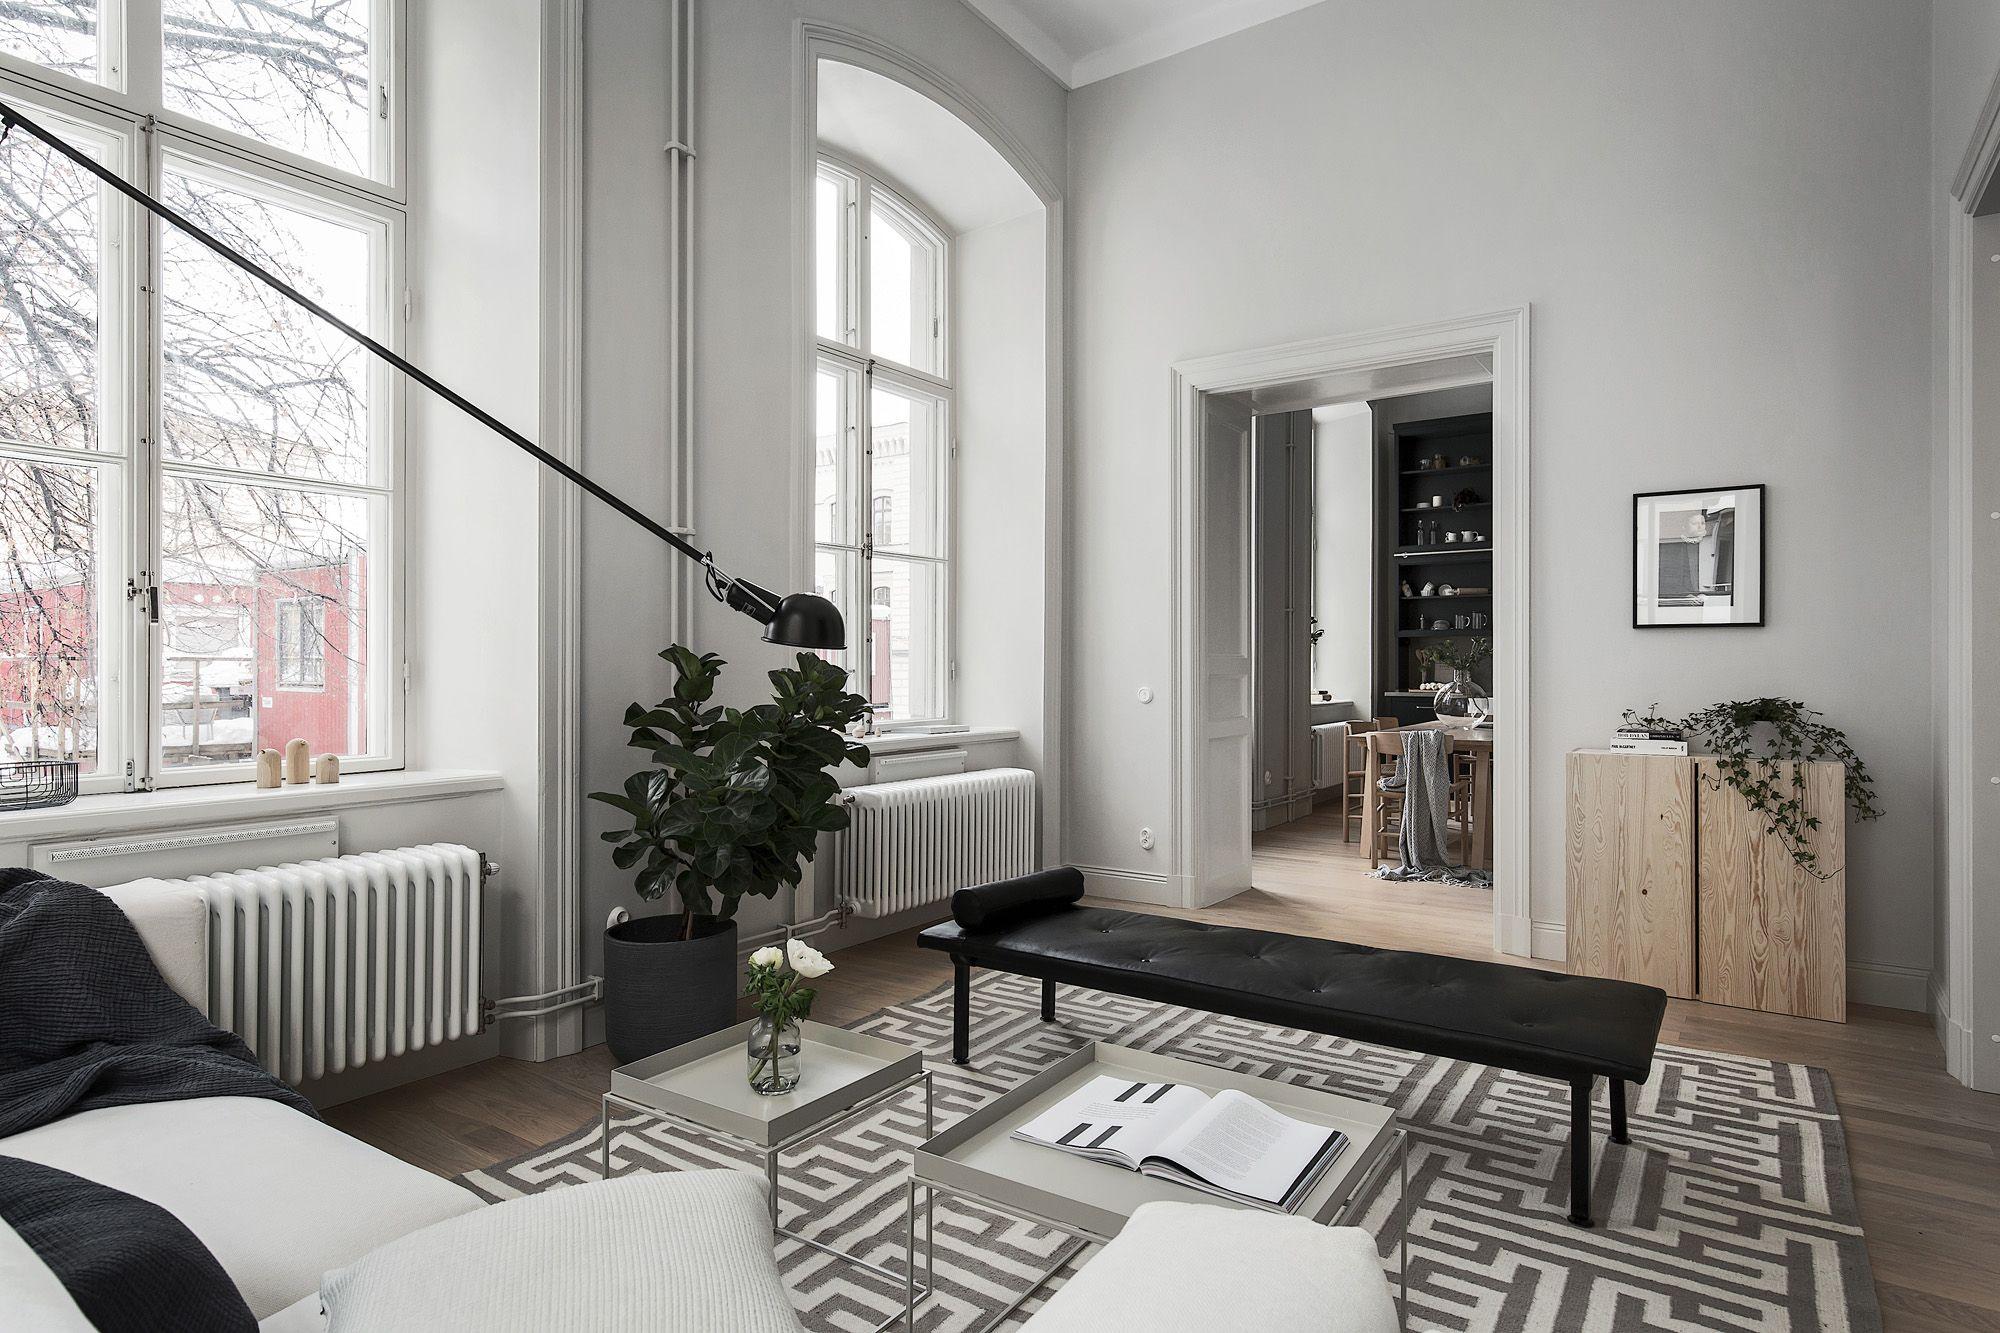 Beautiful Innerstadsspecialisten AB   Teknologgatan 8C, 1 Tr · Deco InteriorsOld ...